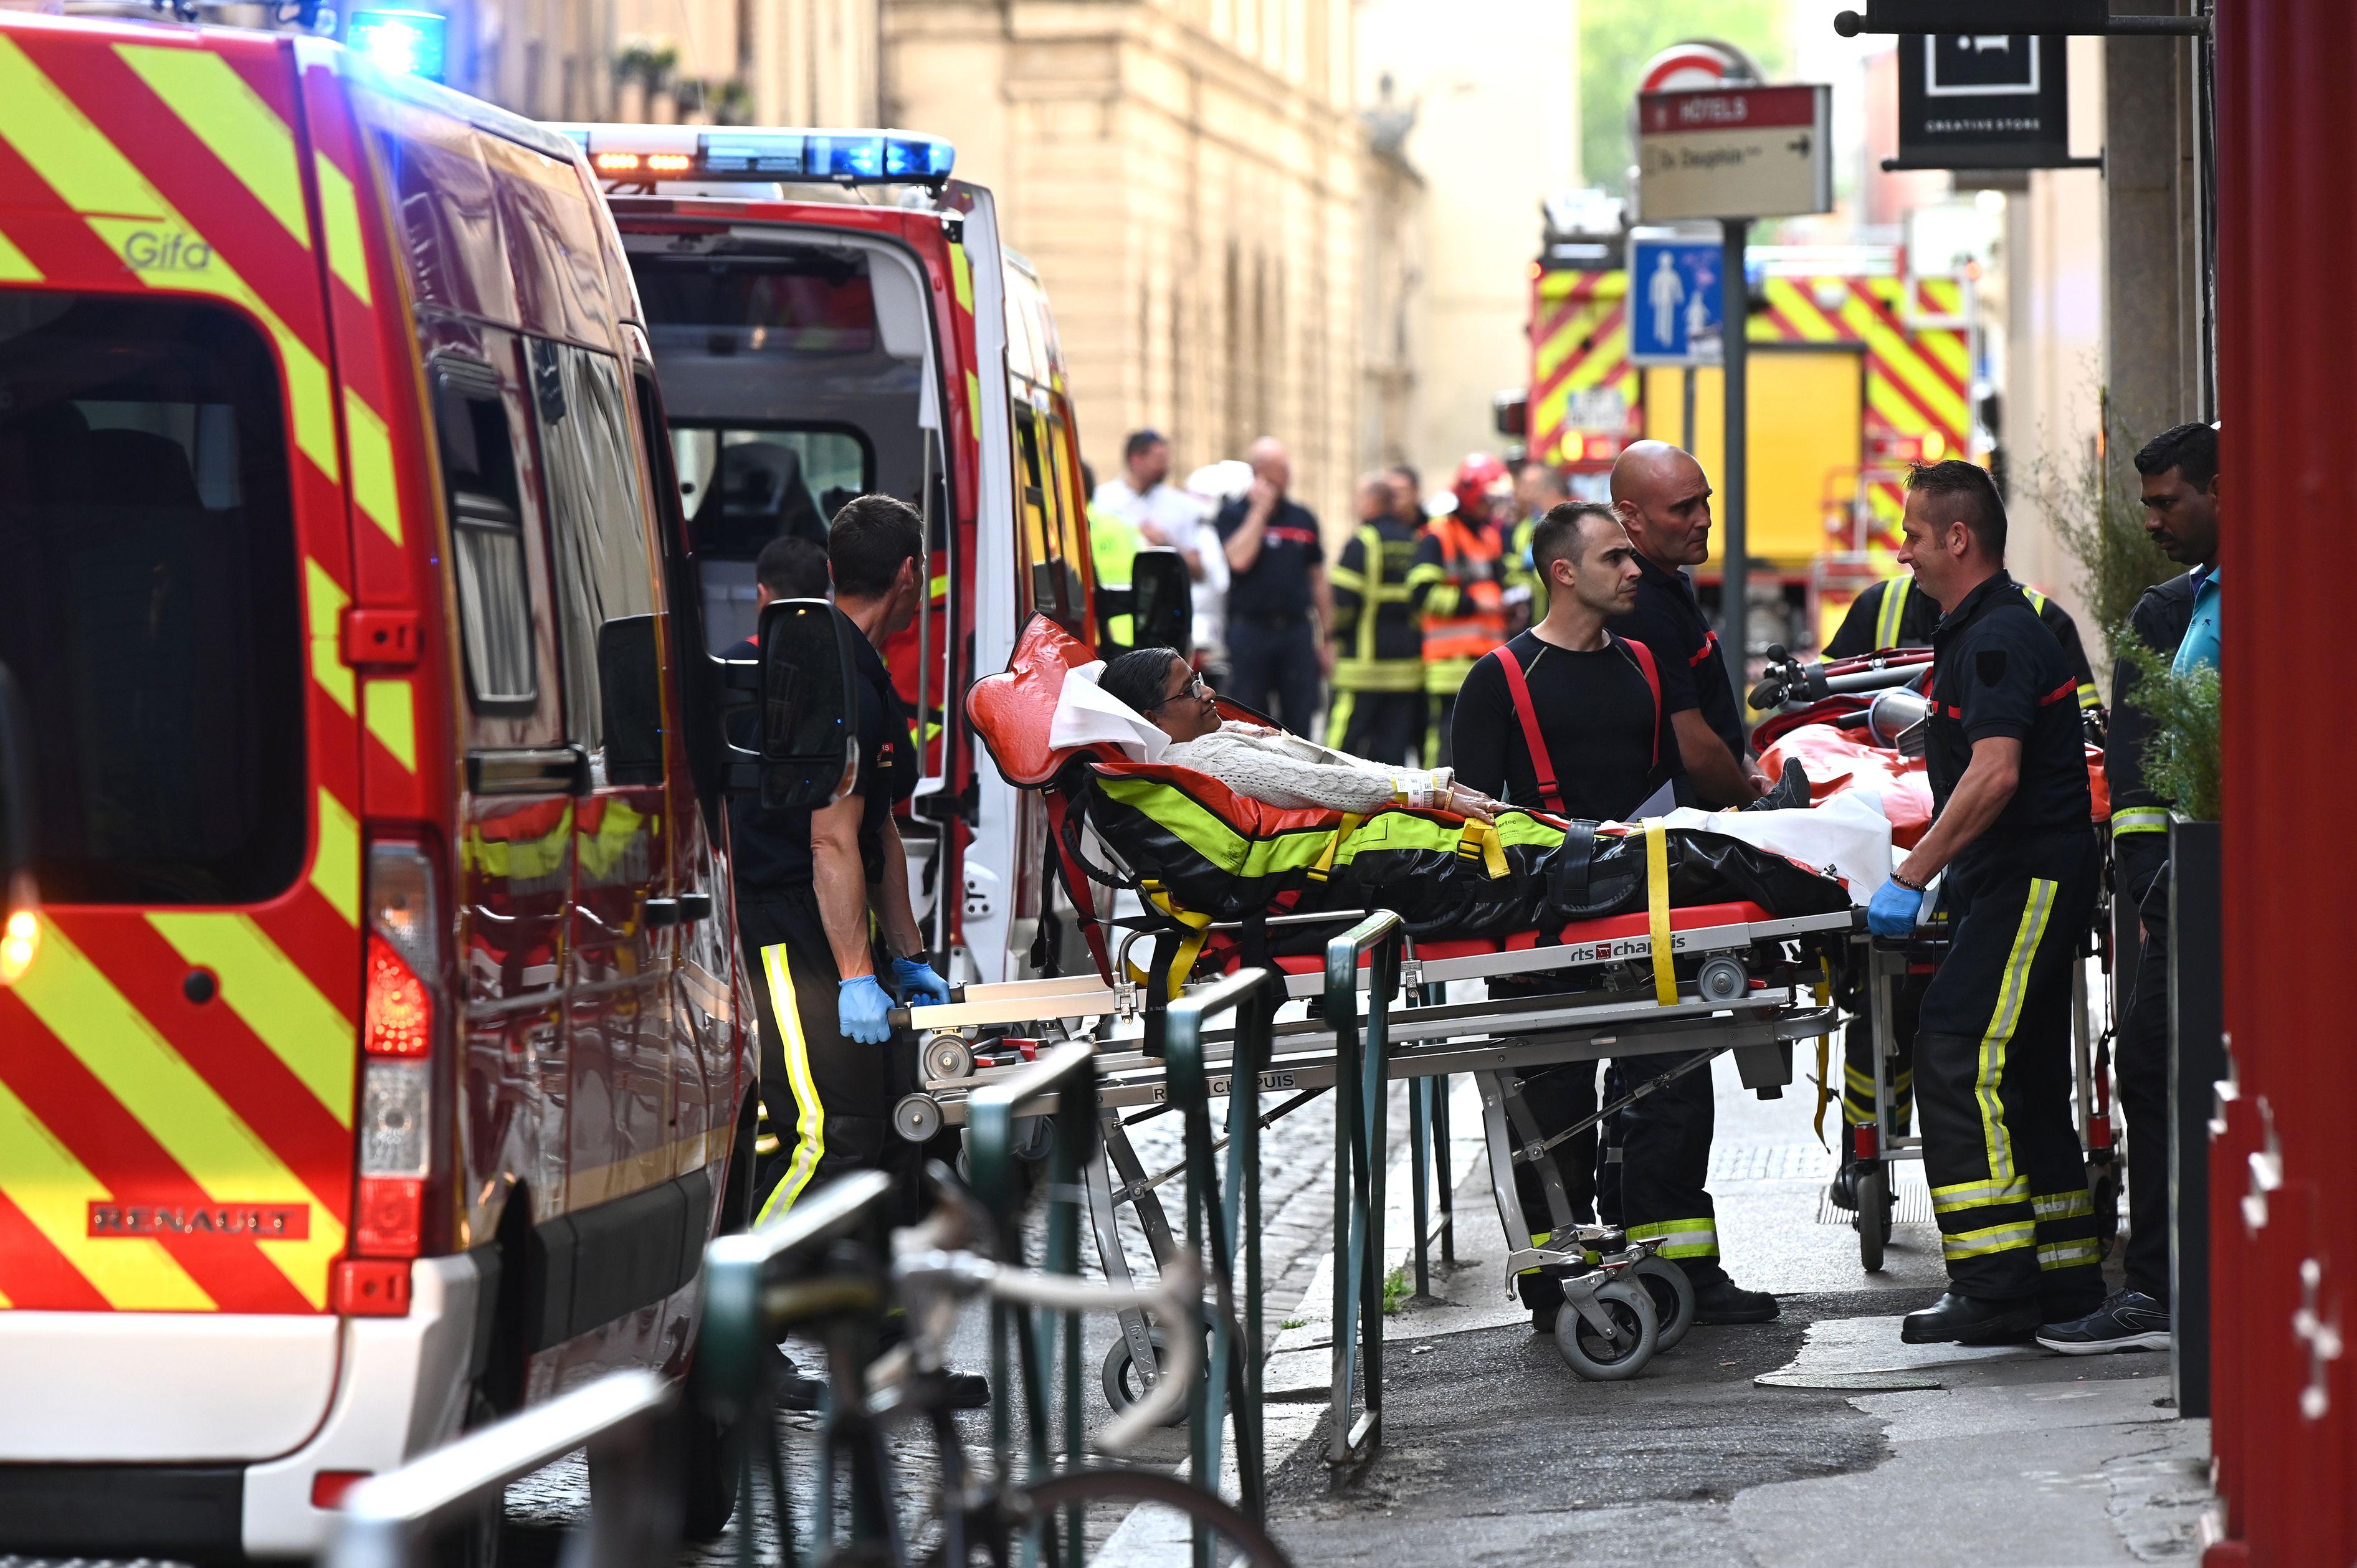 فرنسا: انفجار طرد مُفخّخ وسقوط 13 جريحا